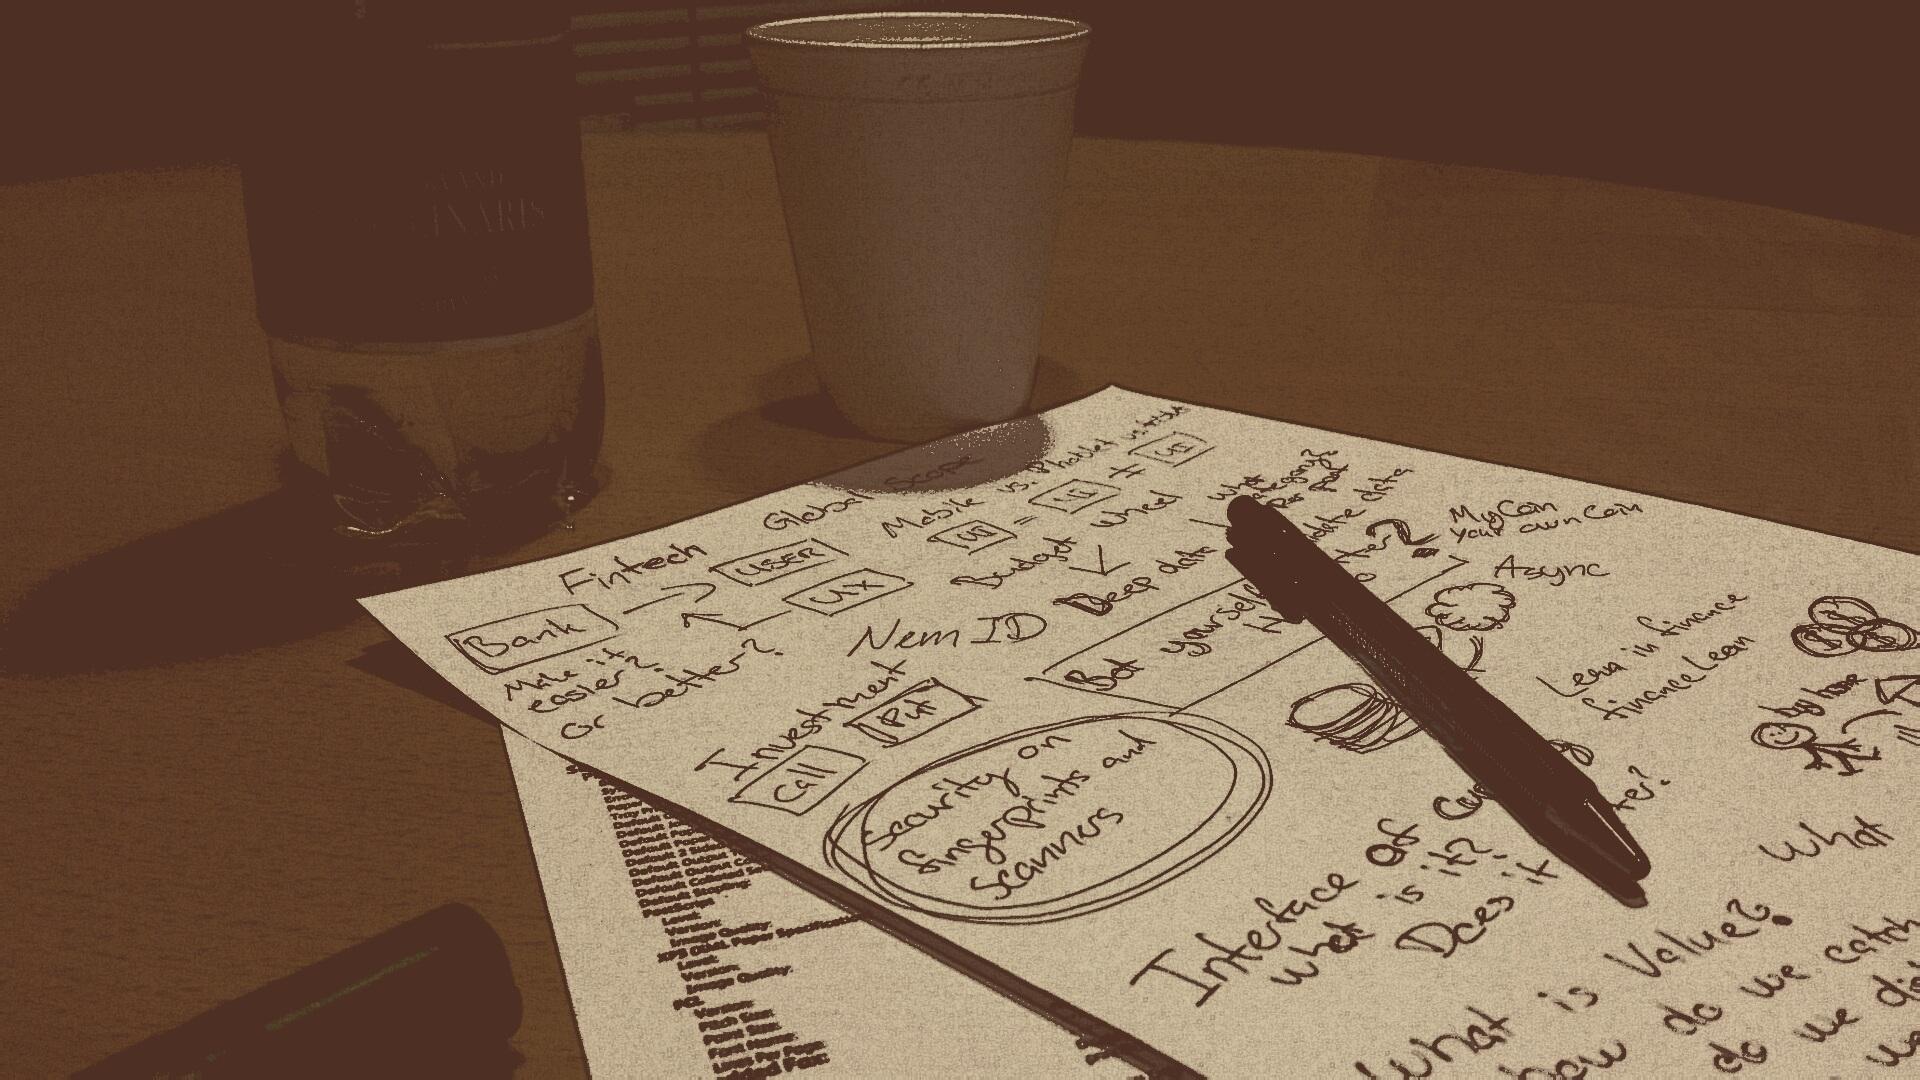 Gambar Penulisan Meja Kayu Pena Cangkir Pola Botol